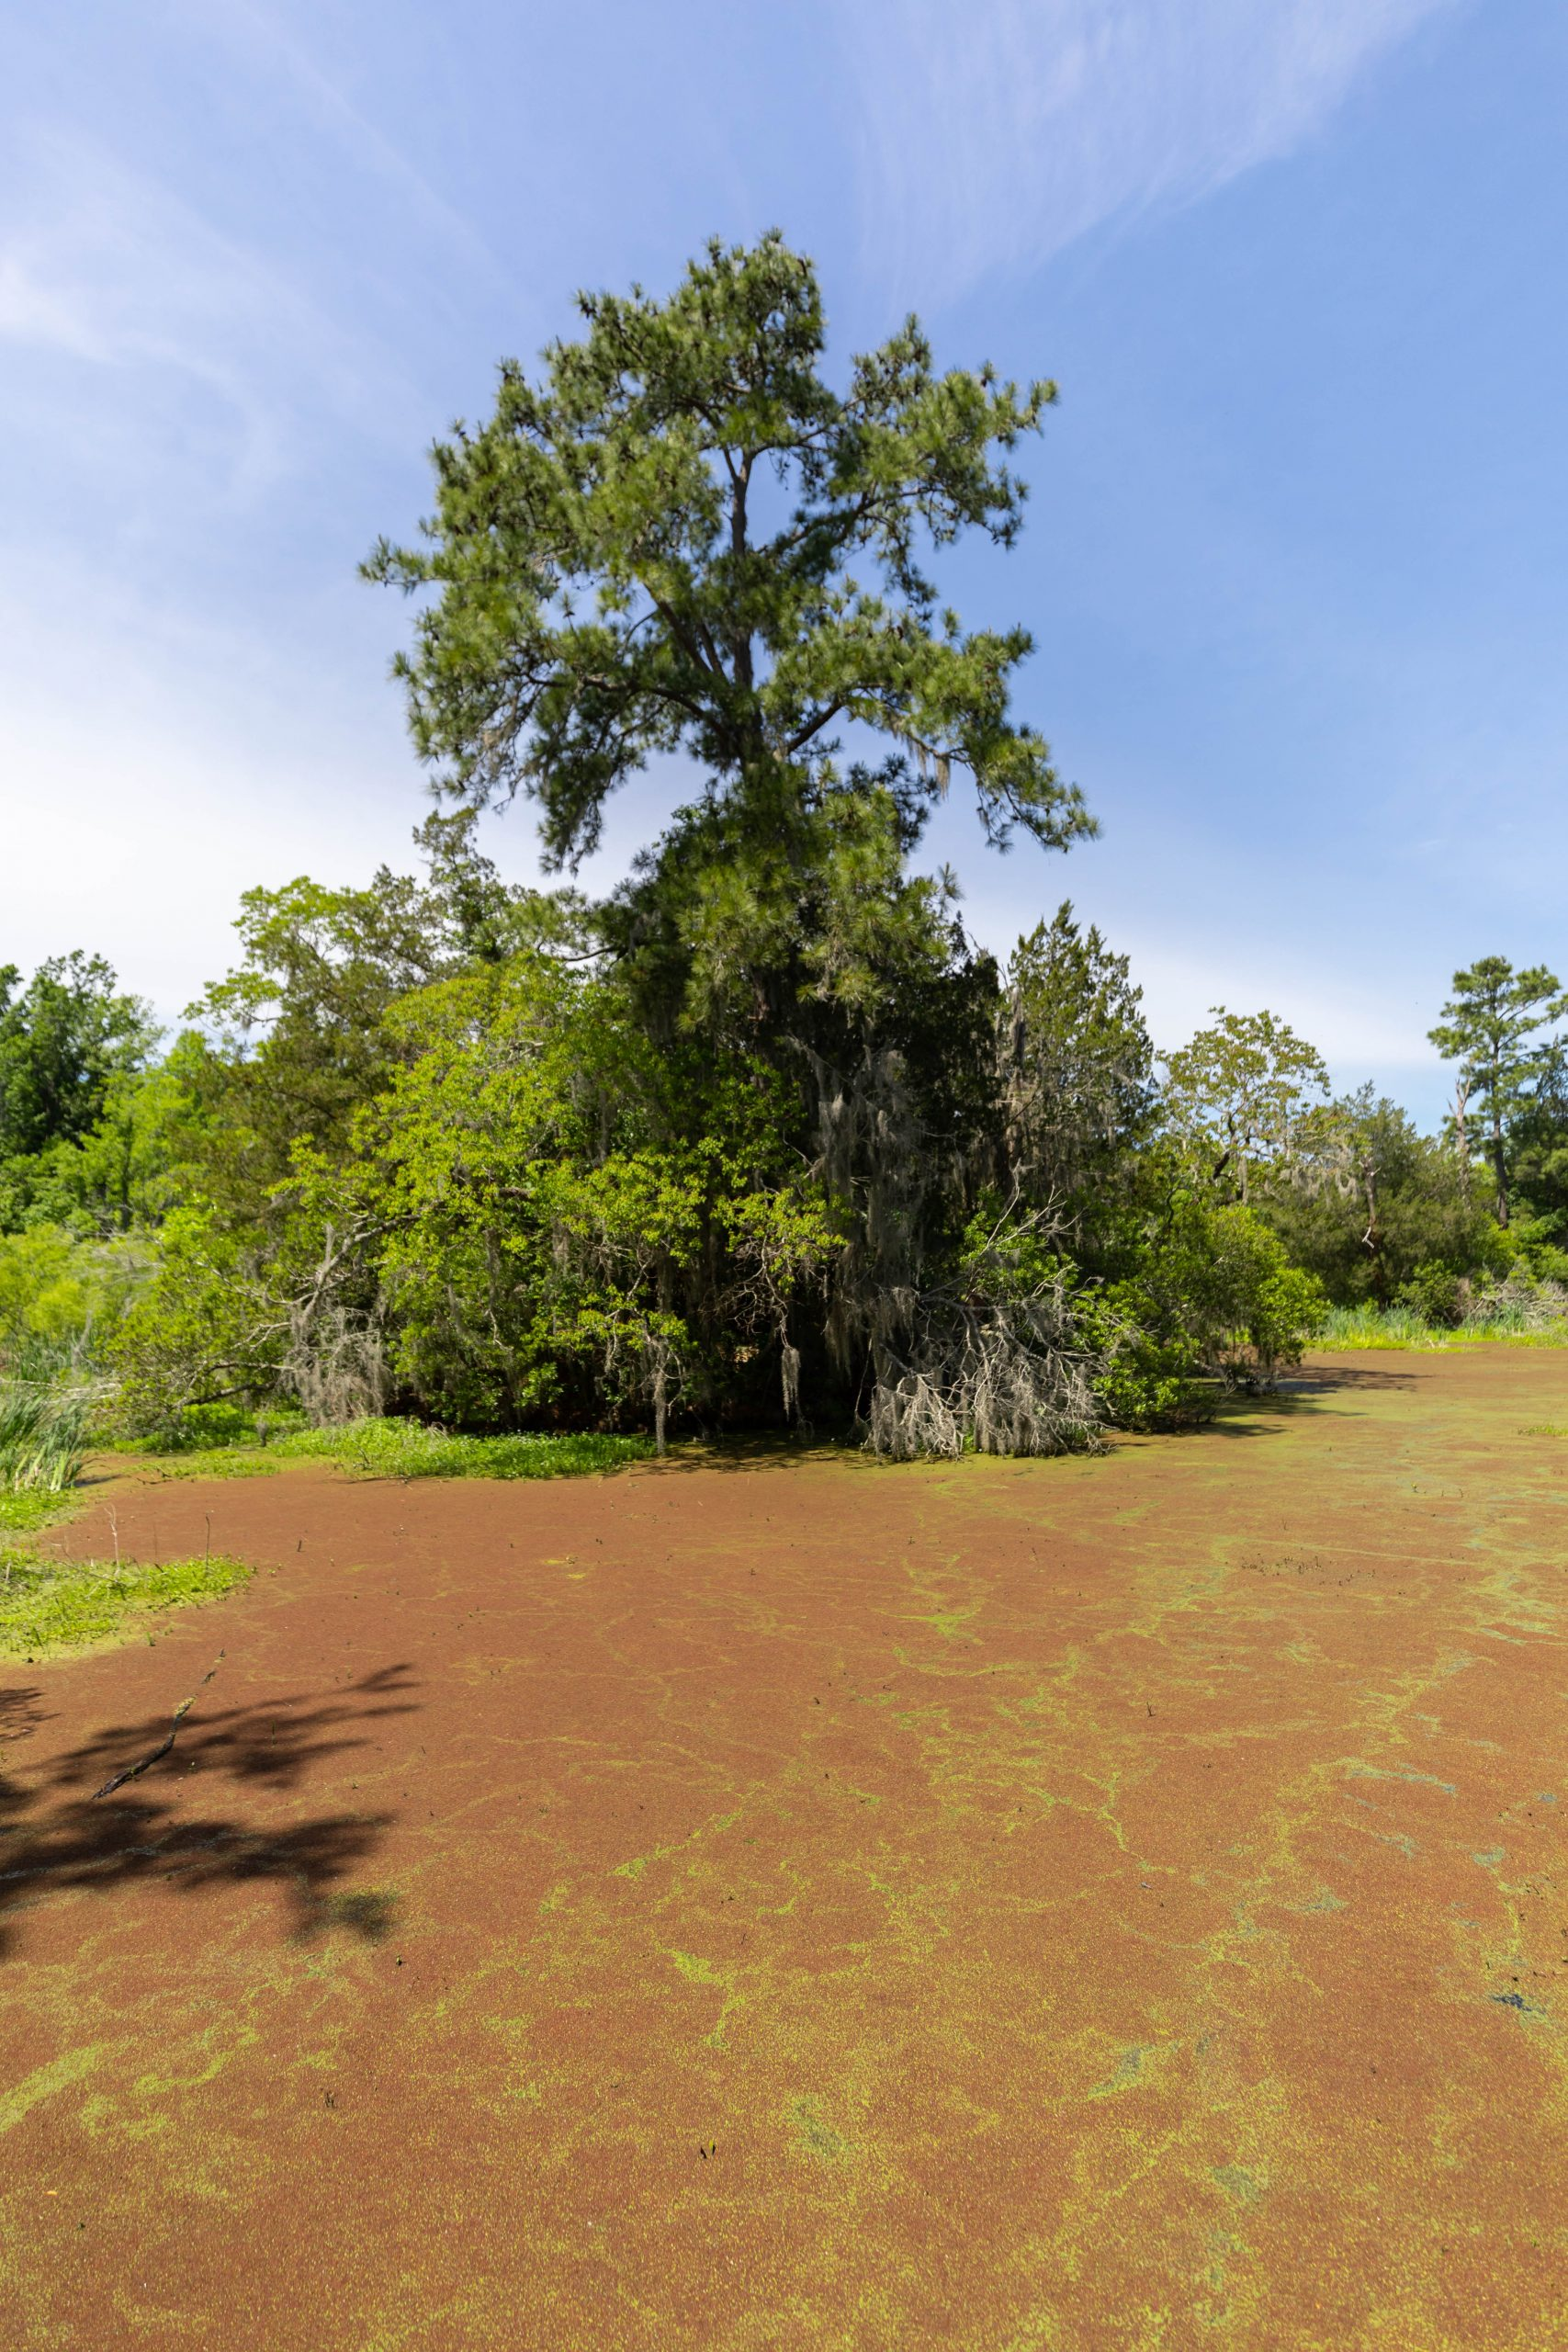 Swamp Safety Audubon Swamp Garden Inside Magnolia Plantation in Charleston, South Carolina Photographed by Luxury Travel Writer and Photographer Annie Fairfax